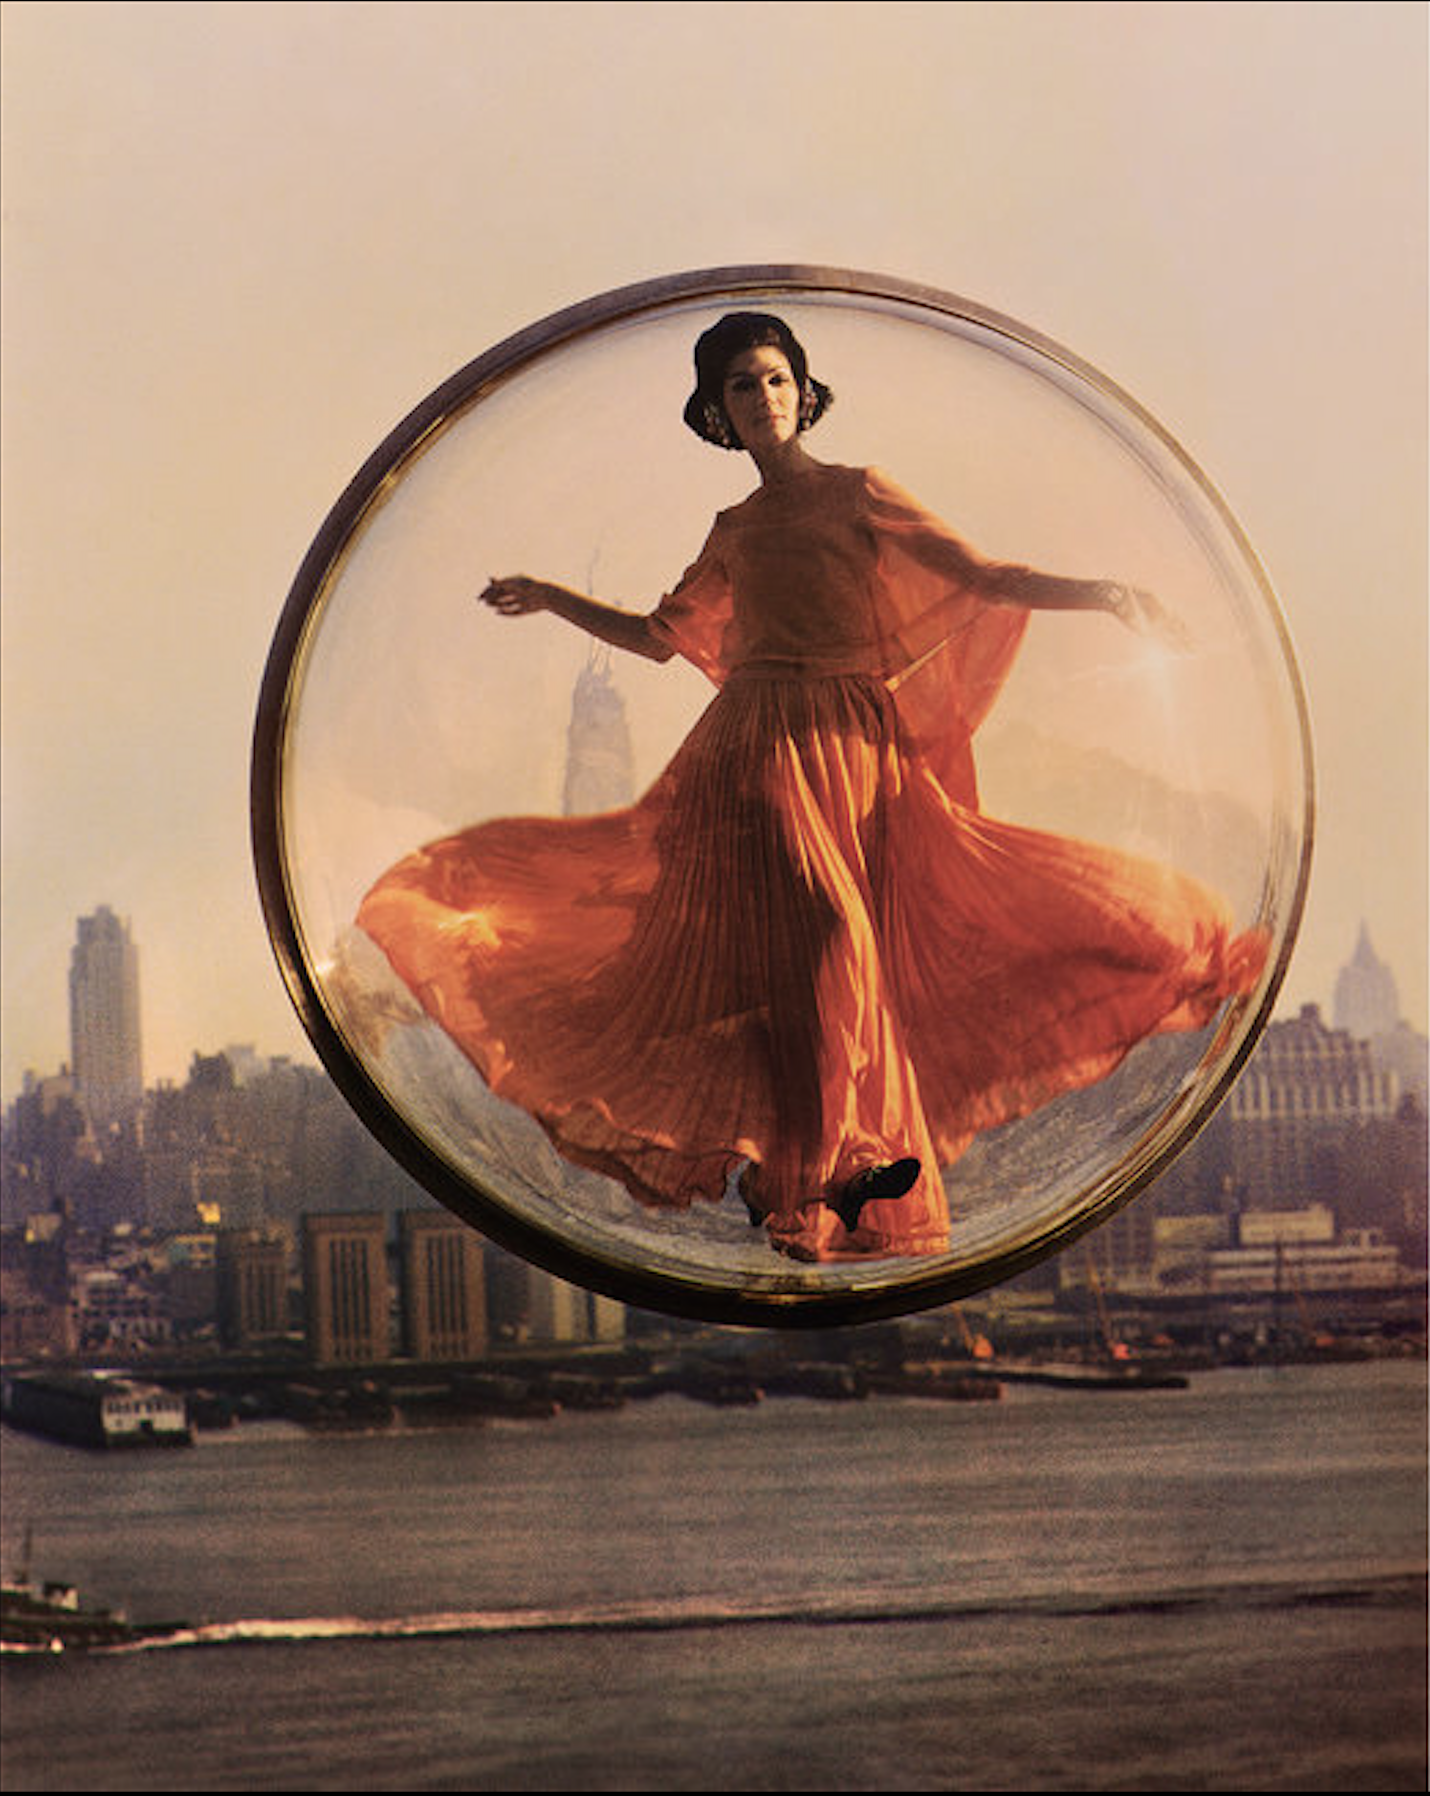 MelvinSokolsky's 1963 Bubble